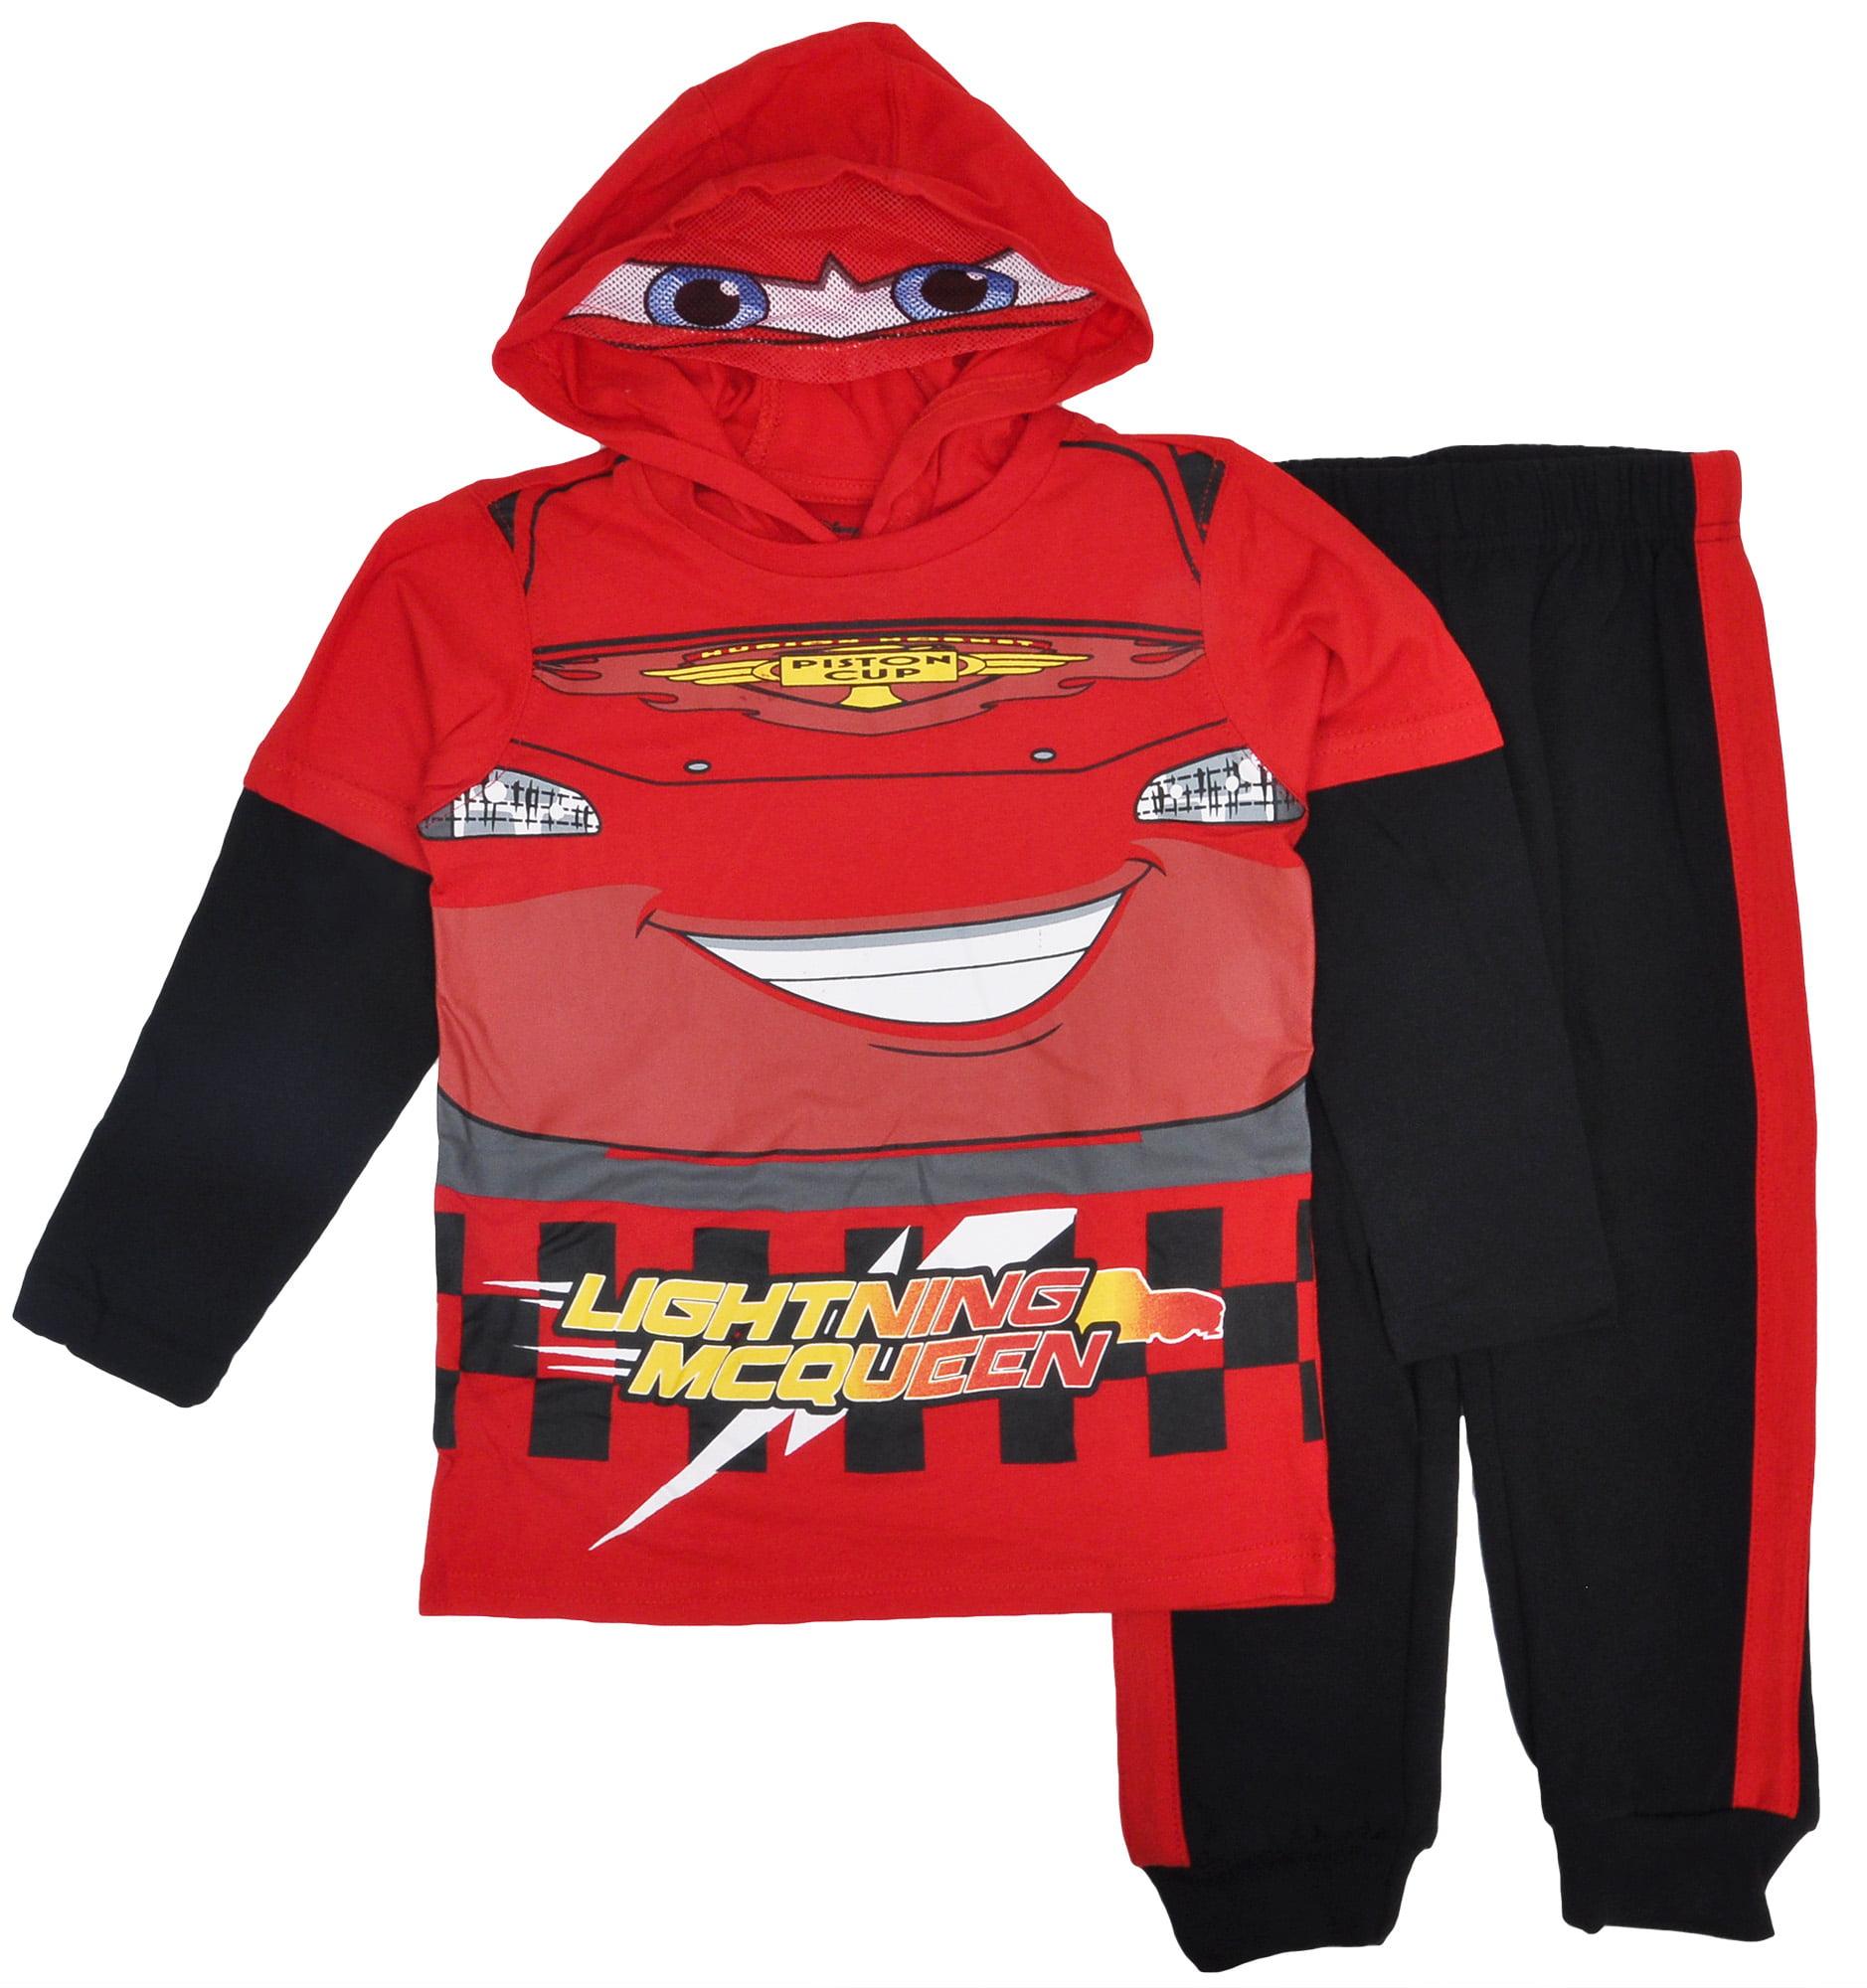 Disney Cars Lightning McQueen Long Sleeve Shirt /& Sweatpants Outfit